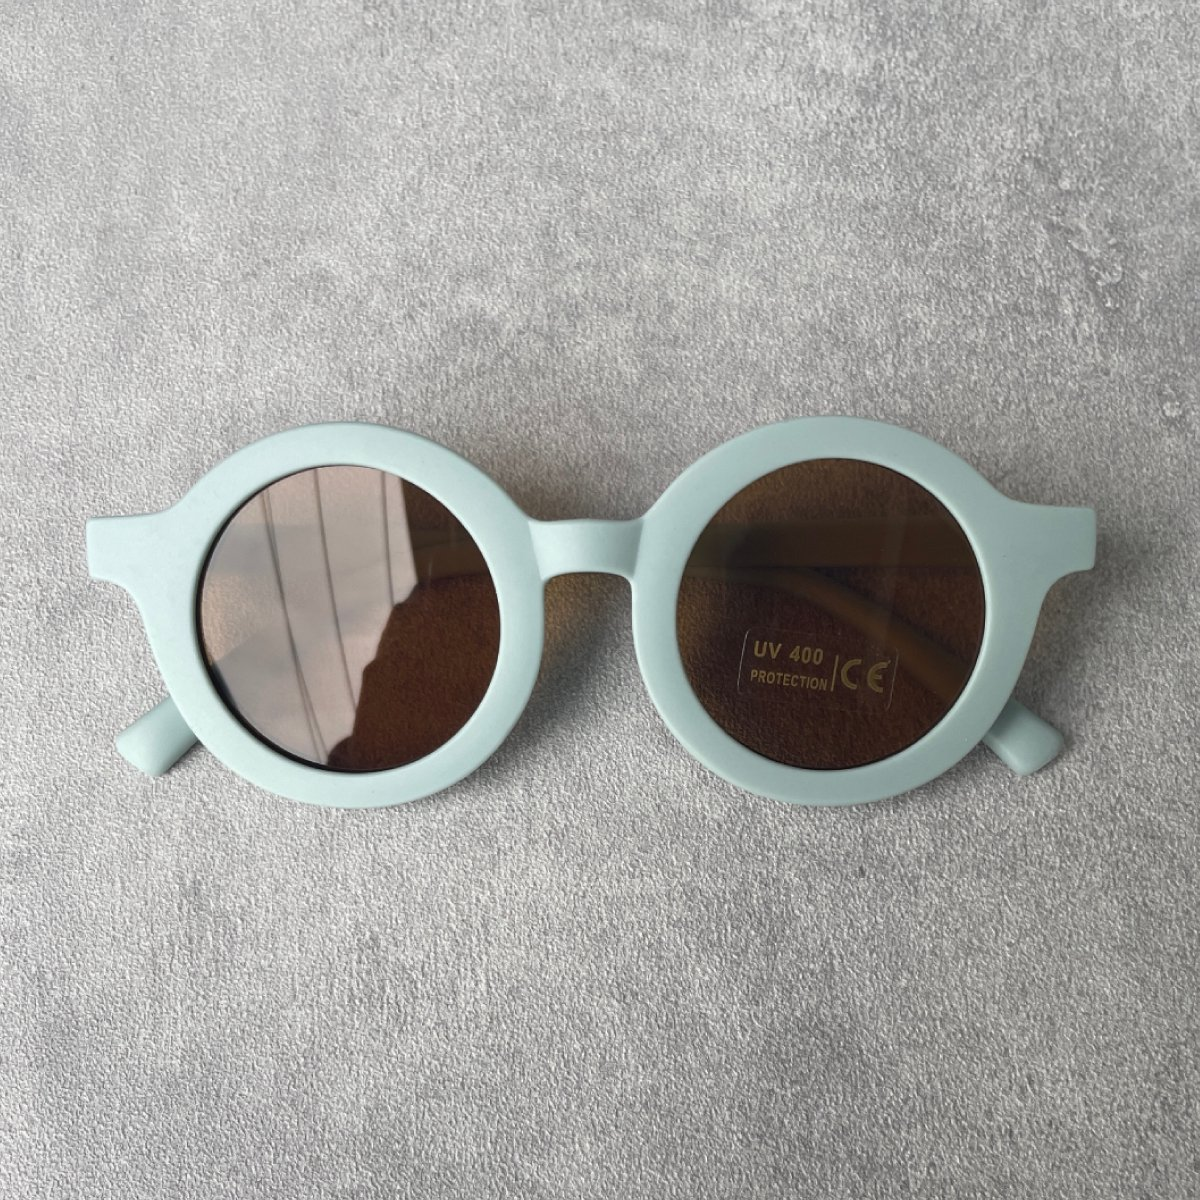 【KIDS】Kids Colorful Sunglasses 詳細画像5